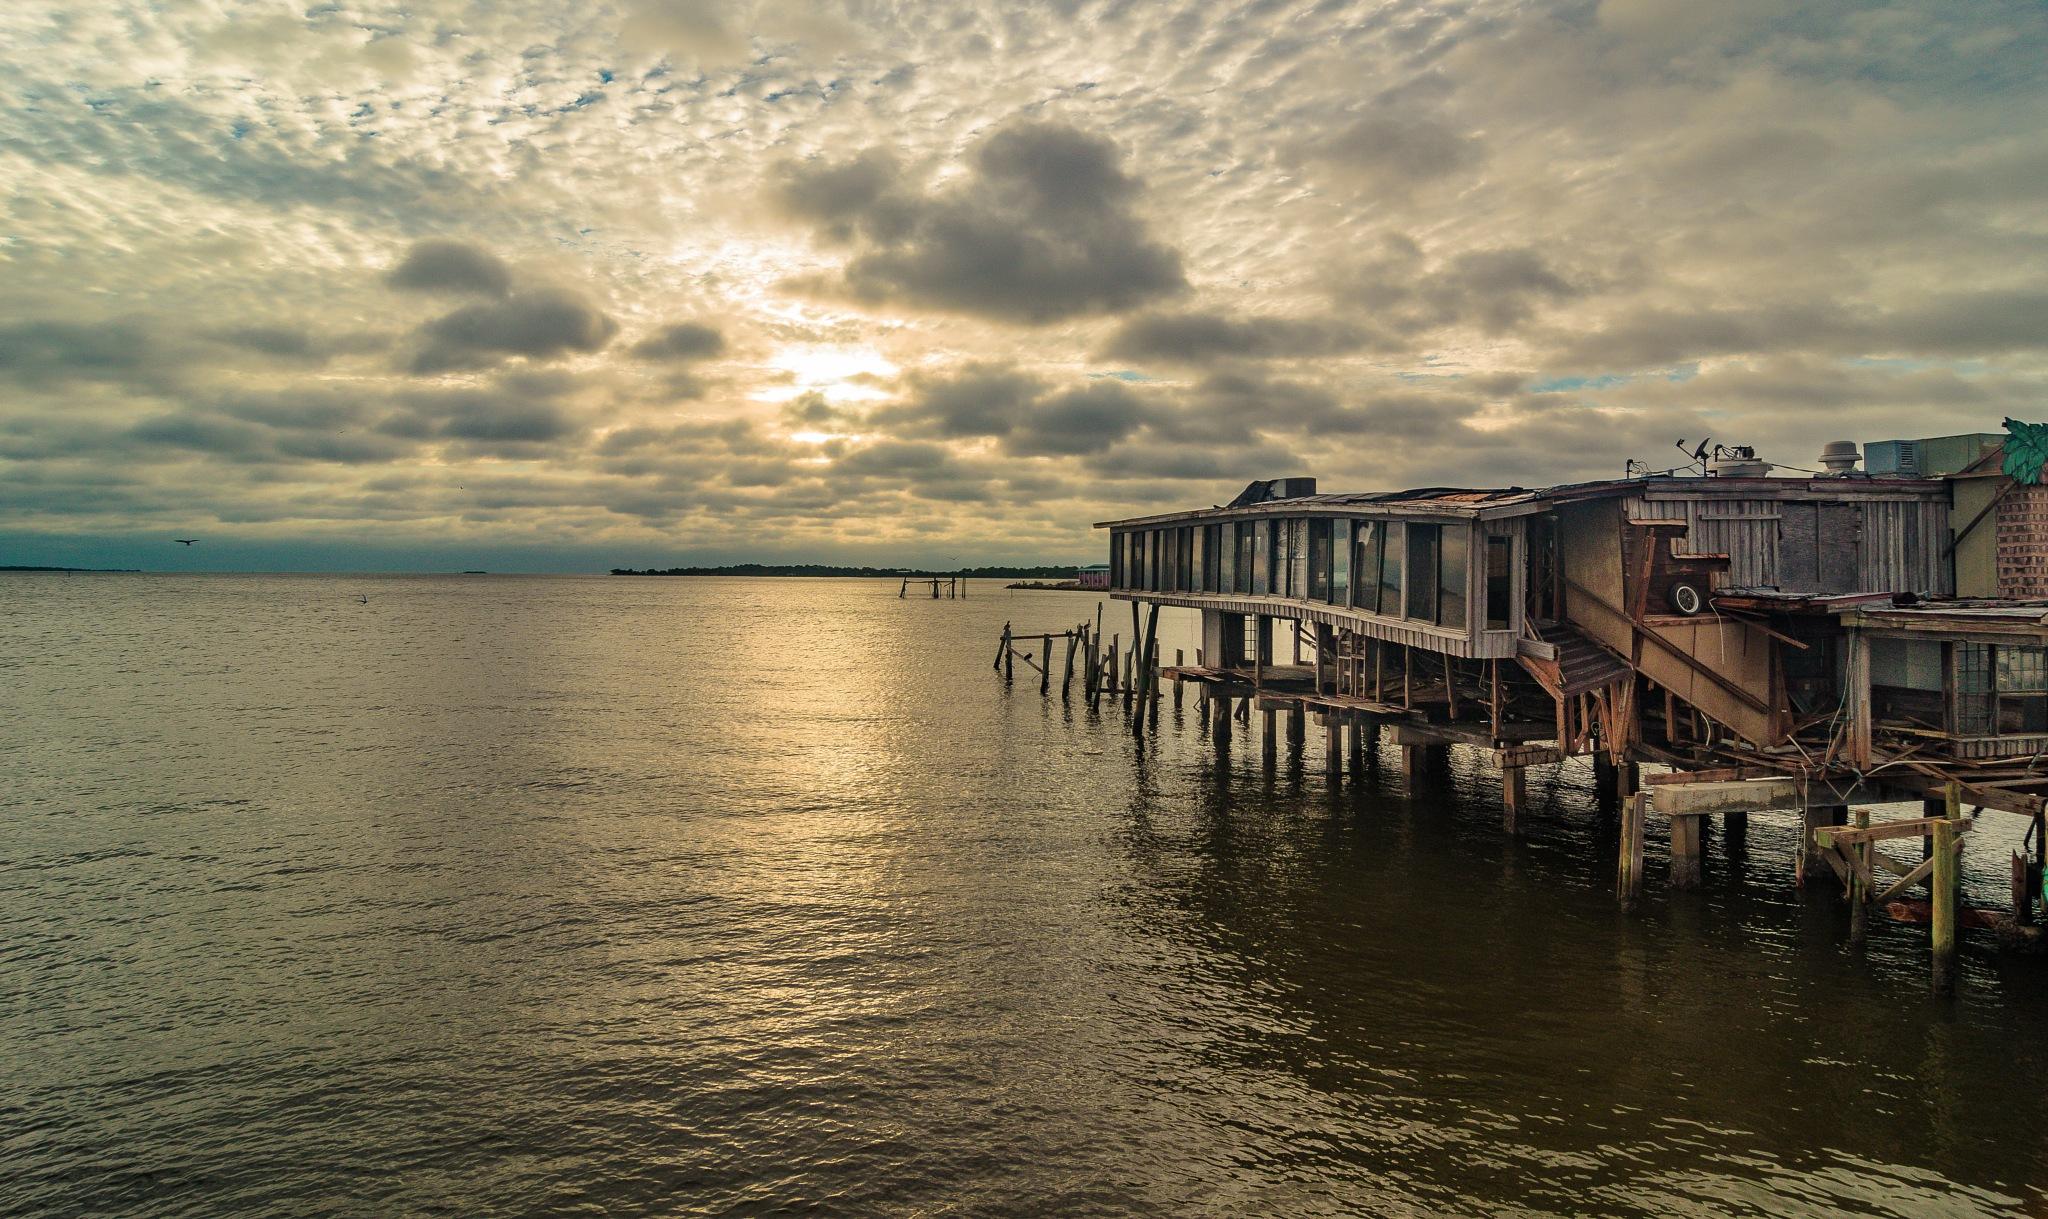 Sunset at Cedar Key by Paul Coleman